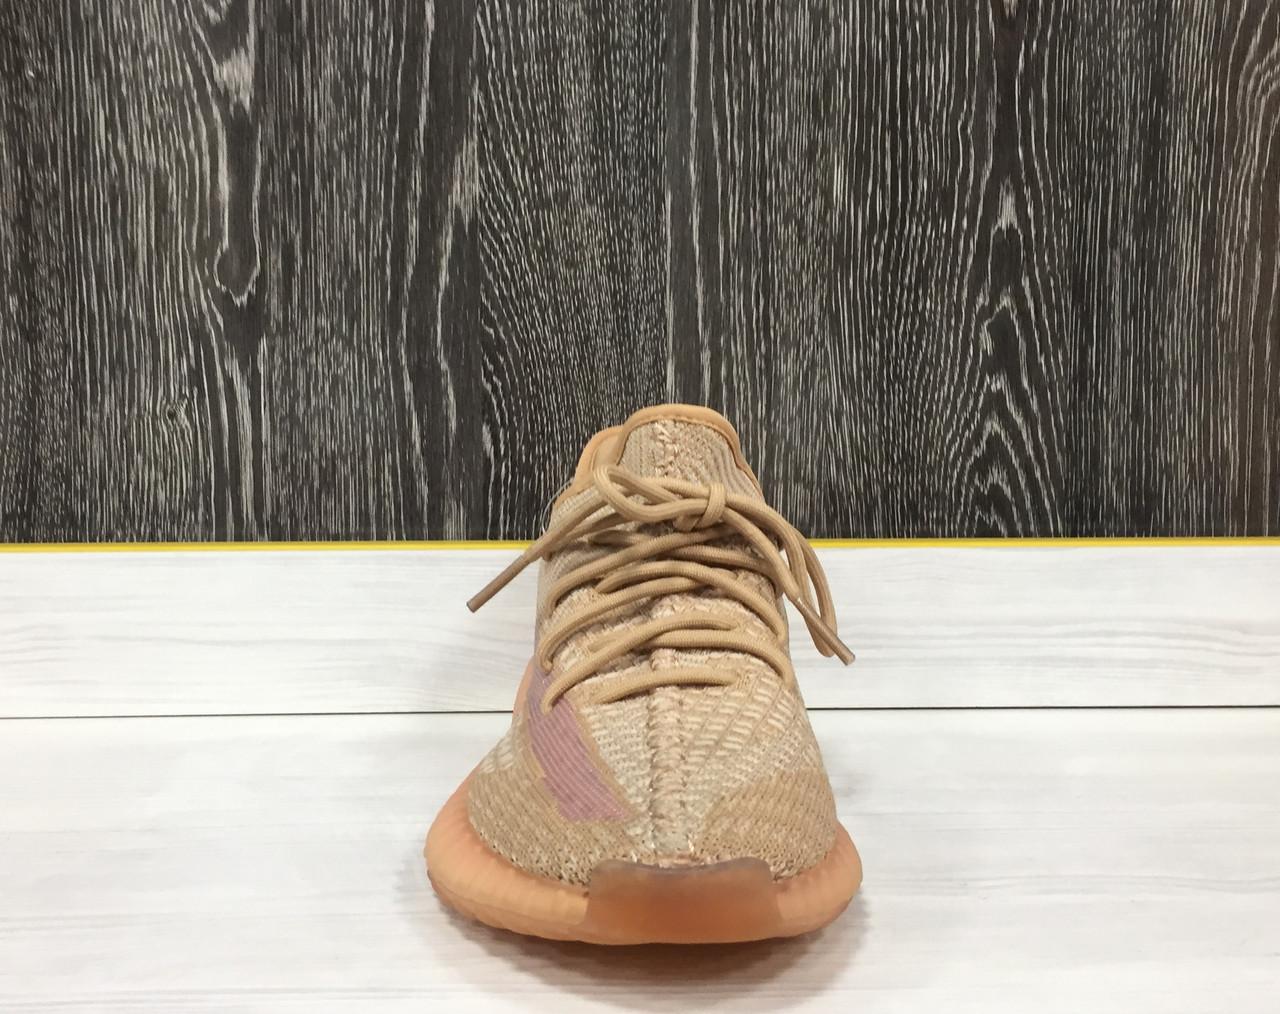 Кроссовки Adidas Yeezy Boost 350 V2 Clay (43 размер) - фото 5